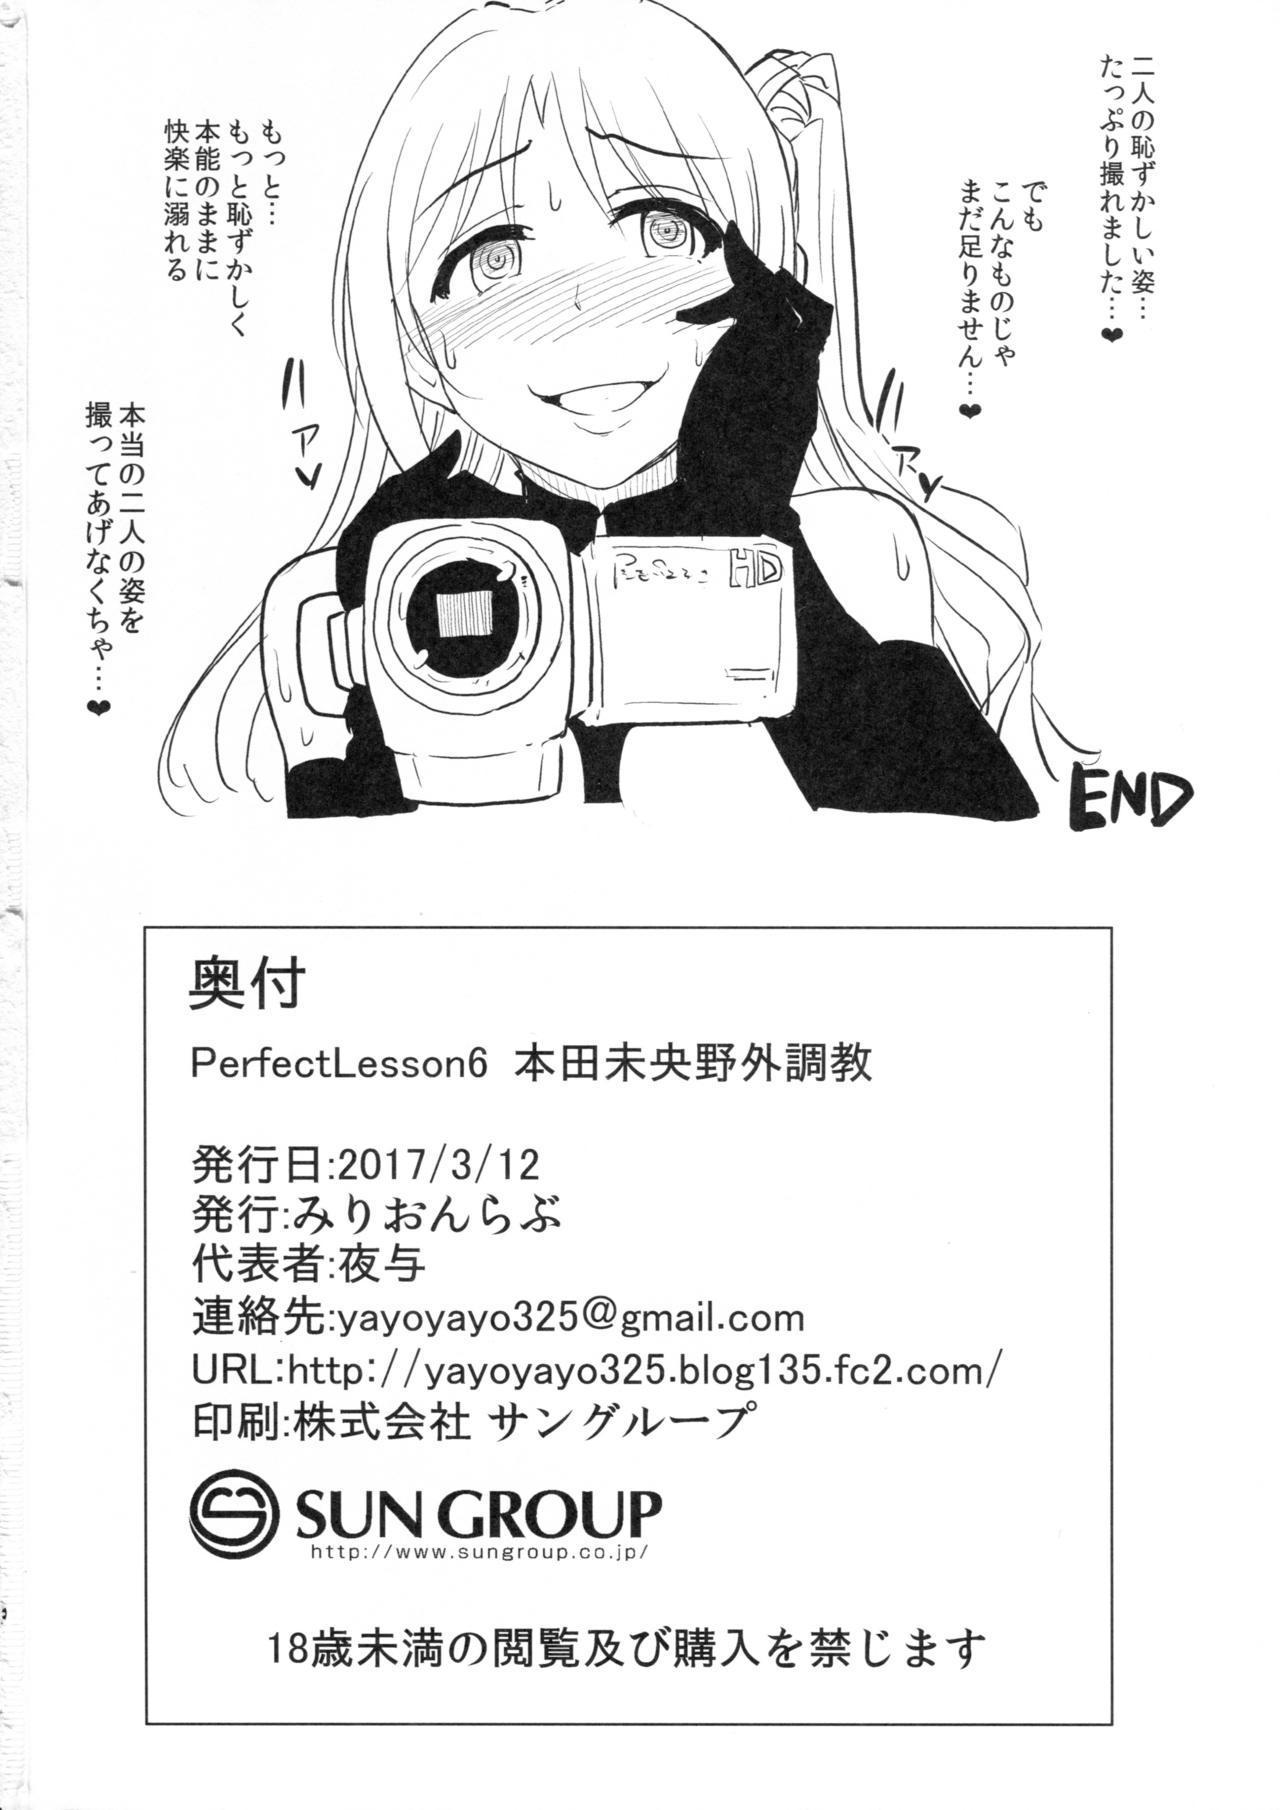 Perfect Lesson 6 - Honda Mio Yagai Choukyou 32